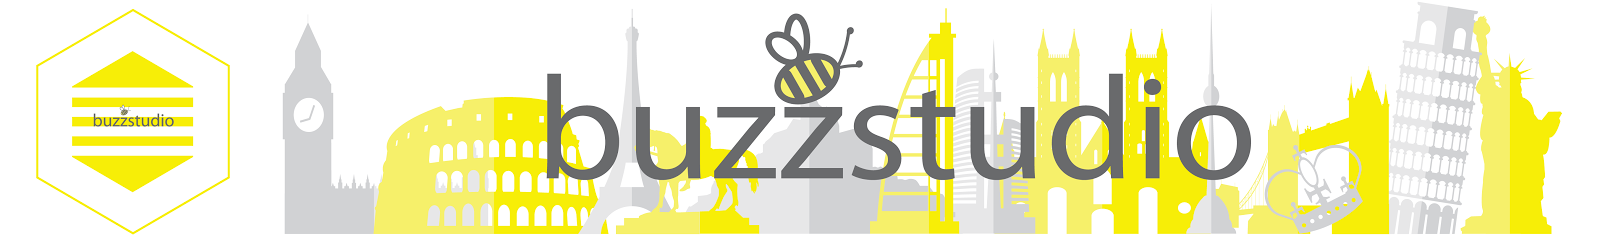 buzzstudio